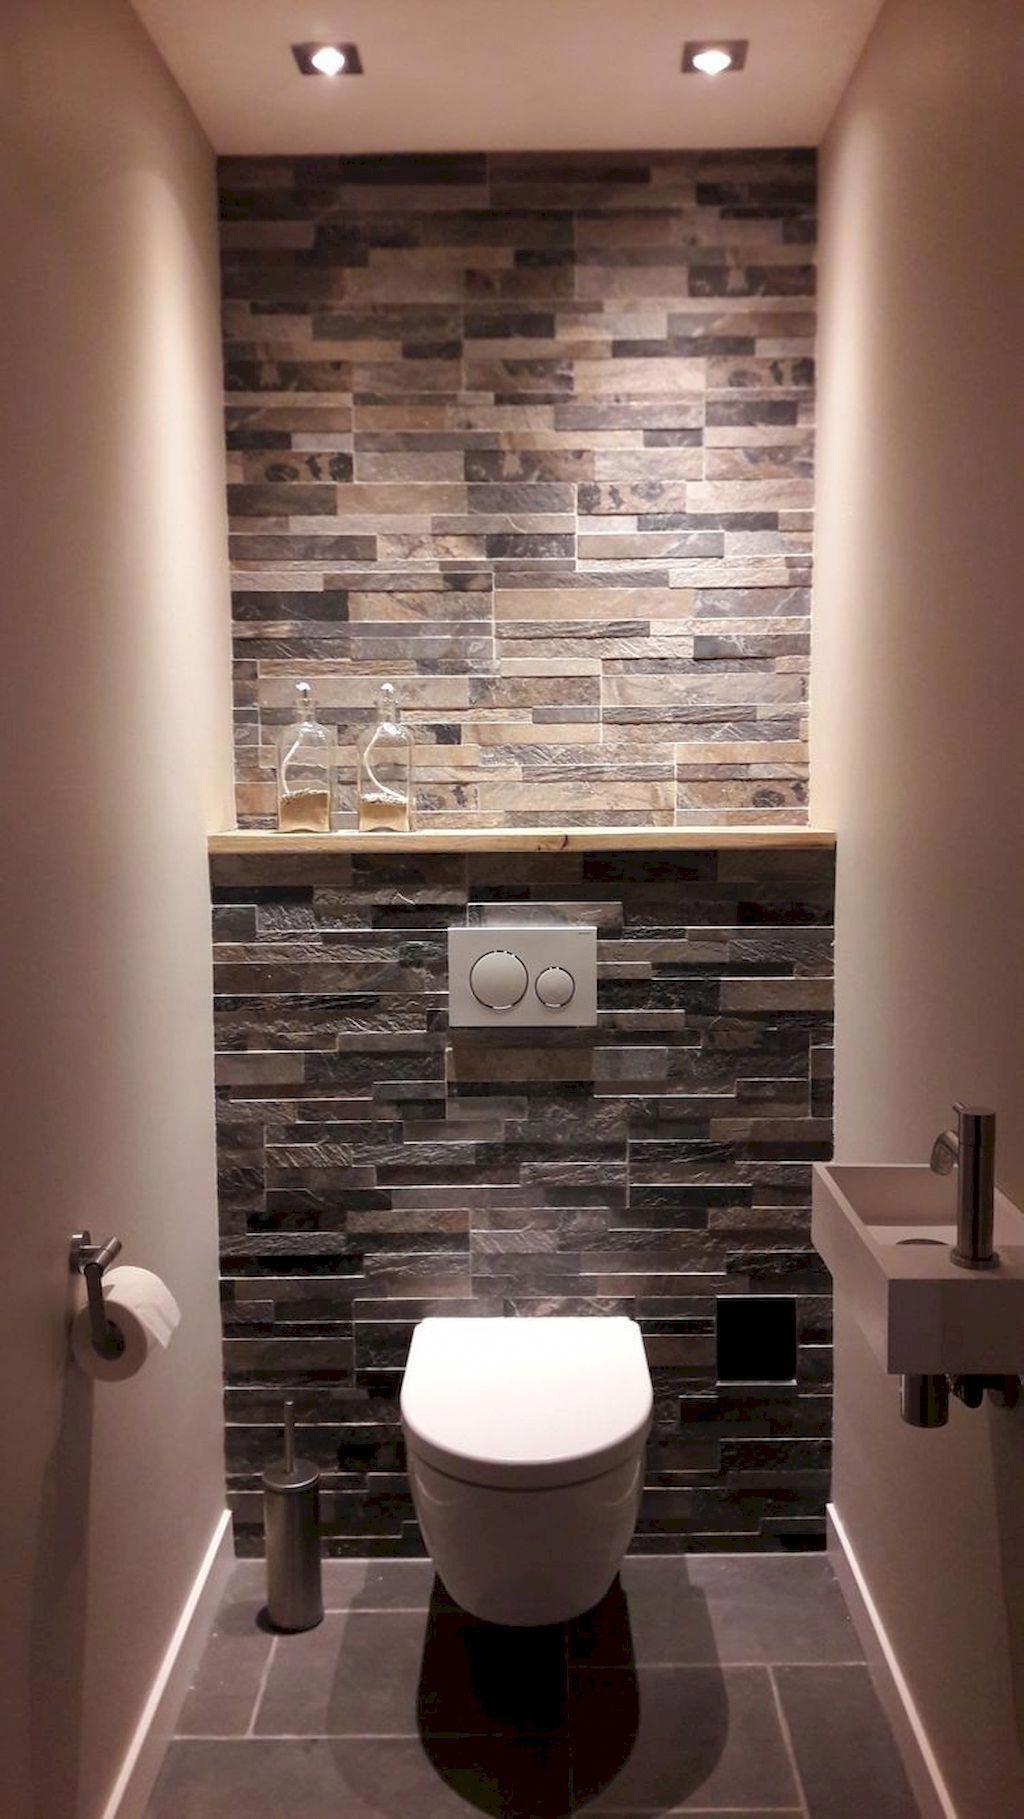 Space Saving Toilet Design For Small Bathroom Home To Z Bathroom Design Small Space Saving Toilet Toilet Design